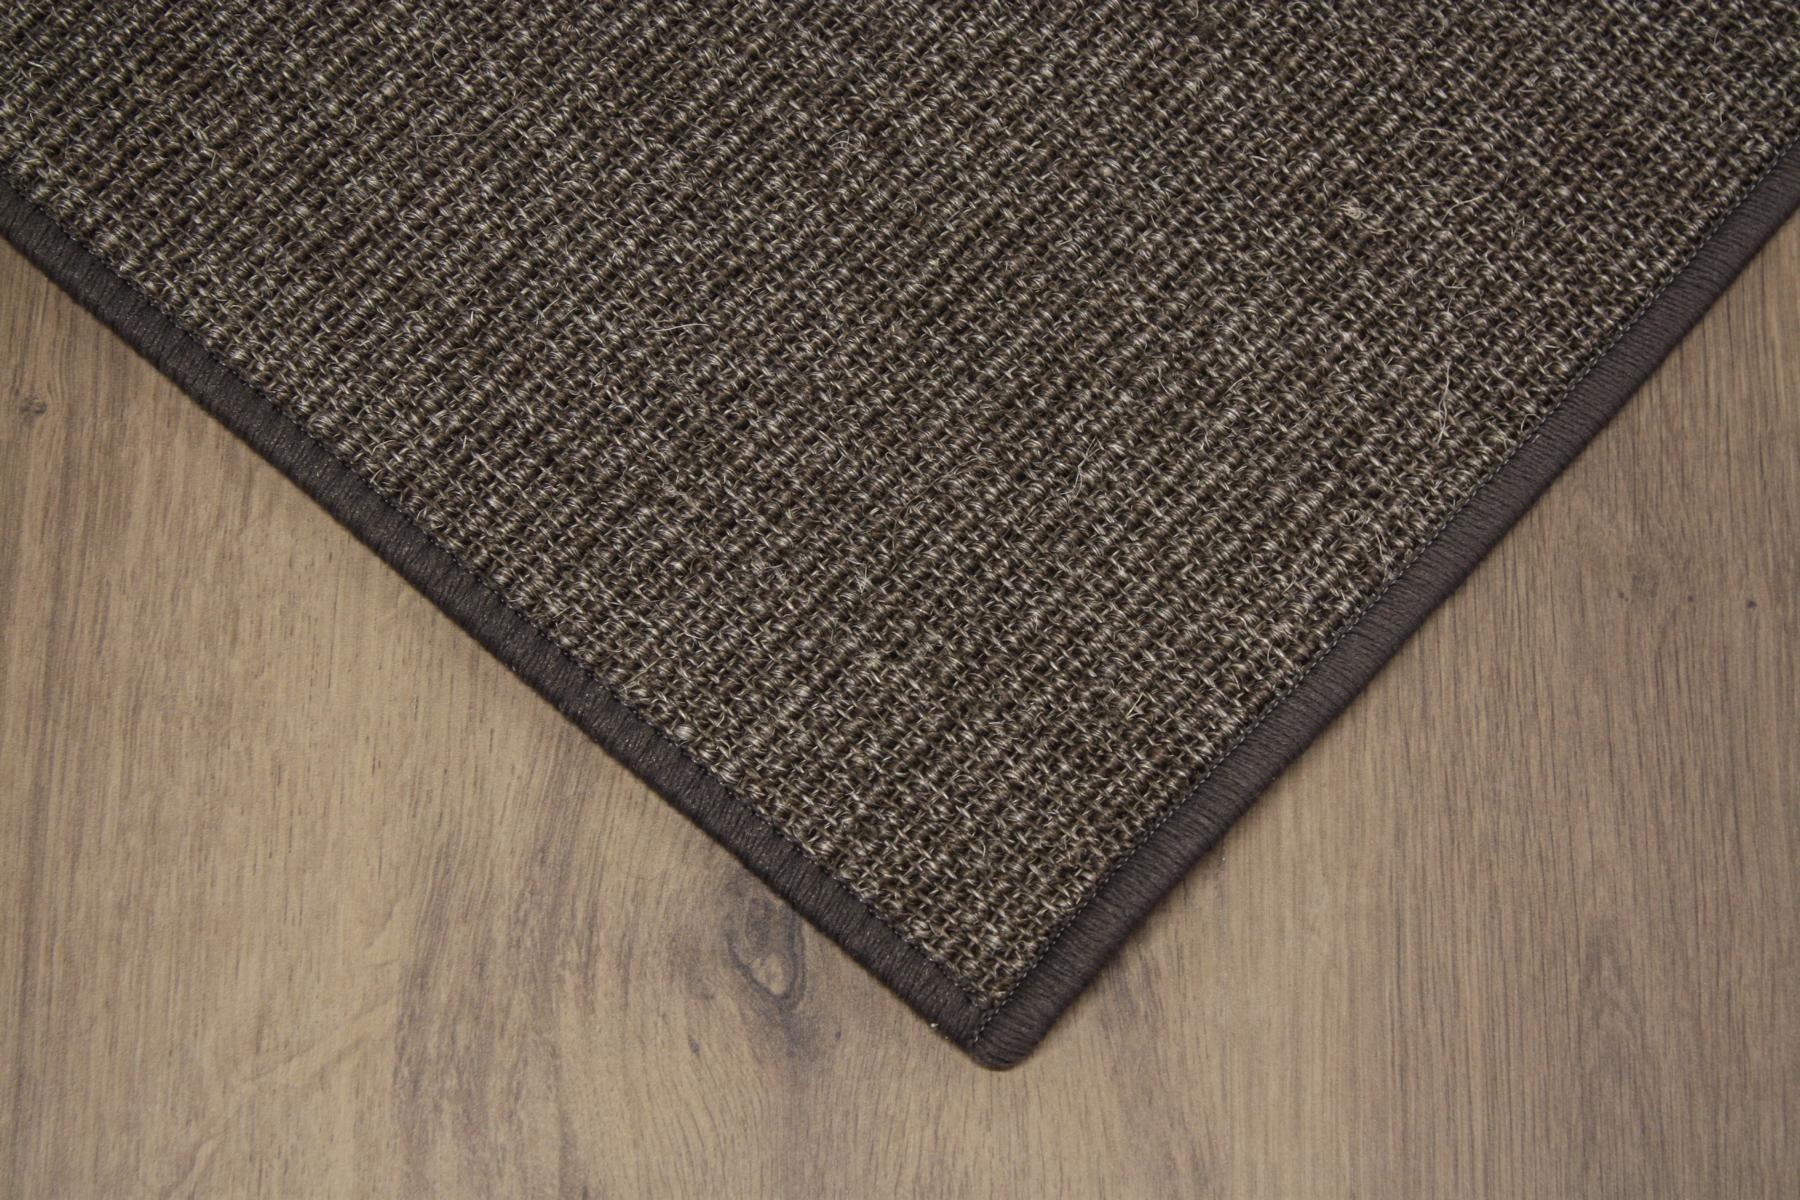 sisal teppich umkettelt kaffee 200x300cm 100 sisal braun gekettelt ebay. Black Bedroom Furniture Sets. Home Design Ideas